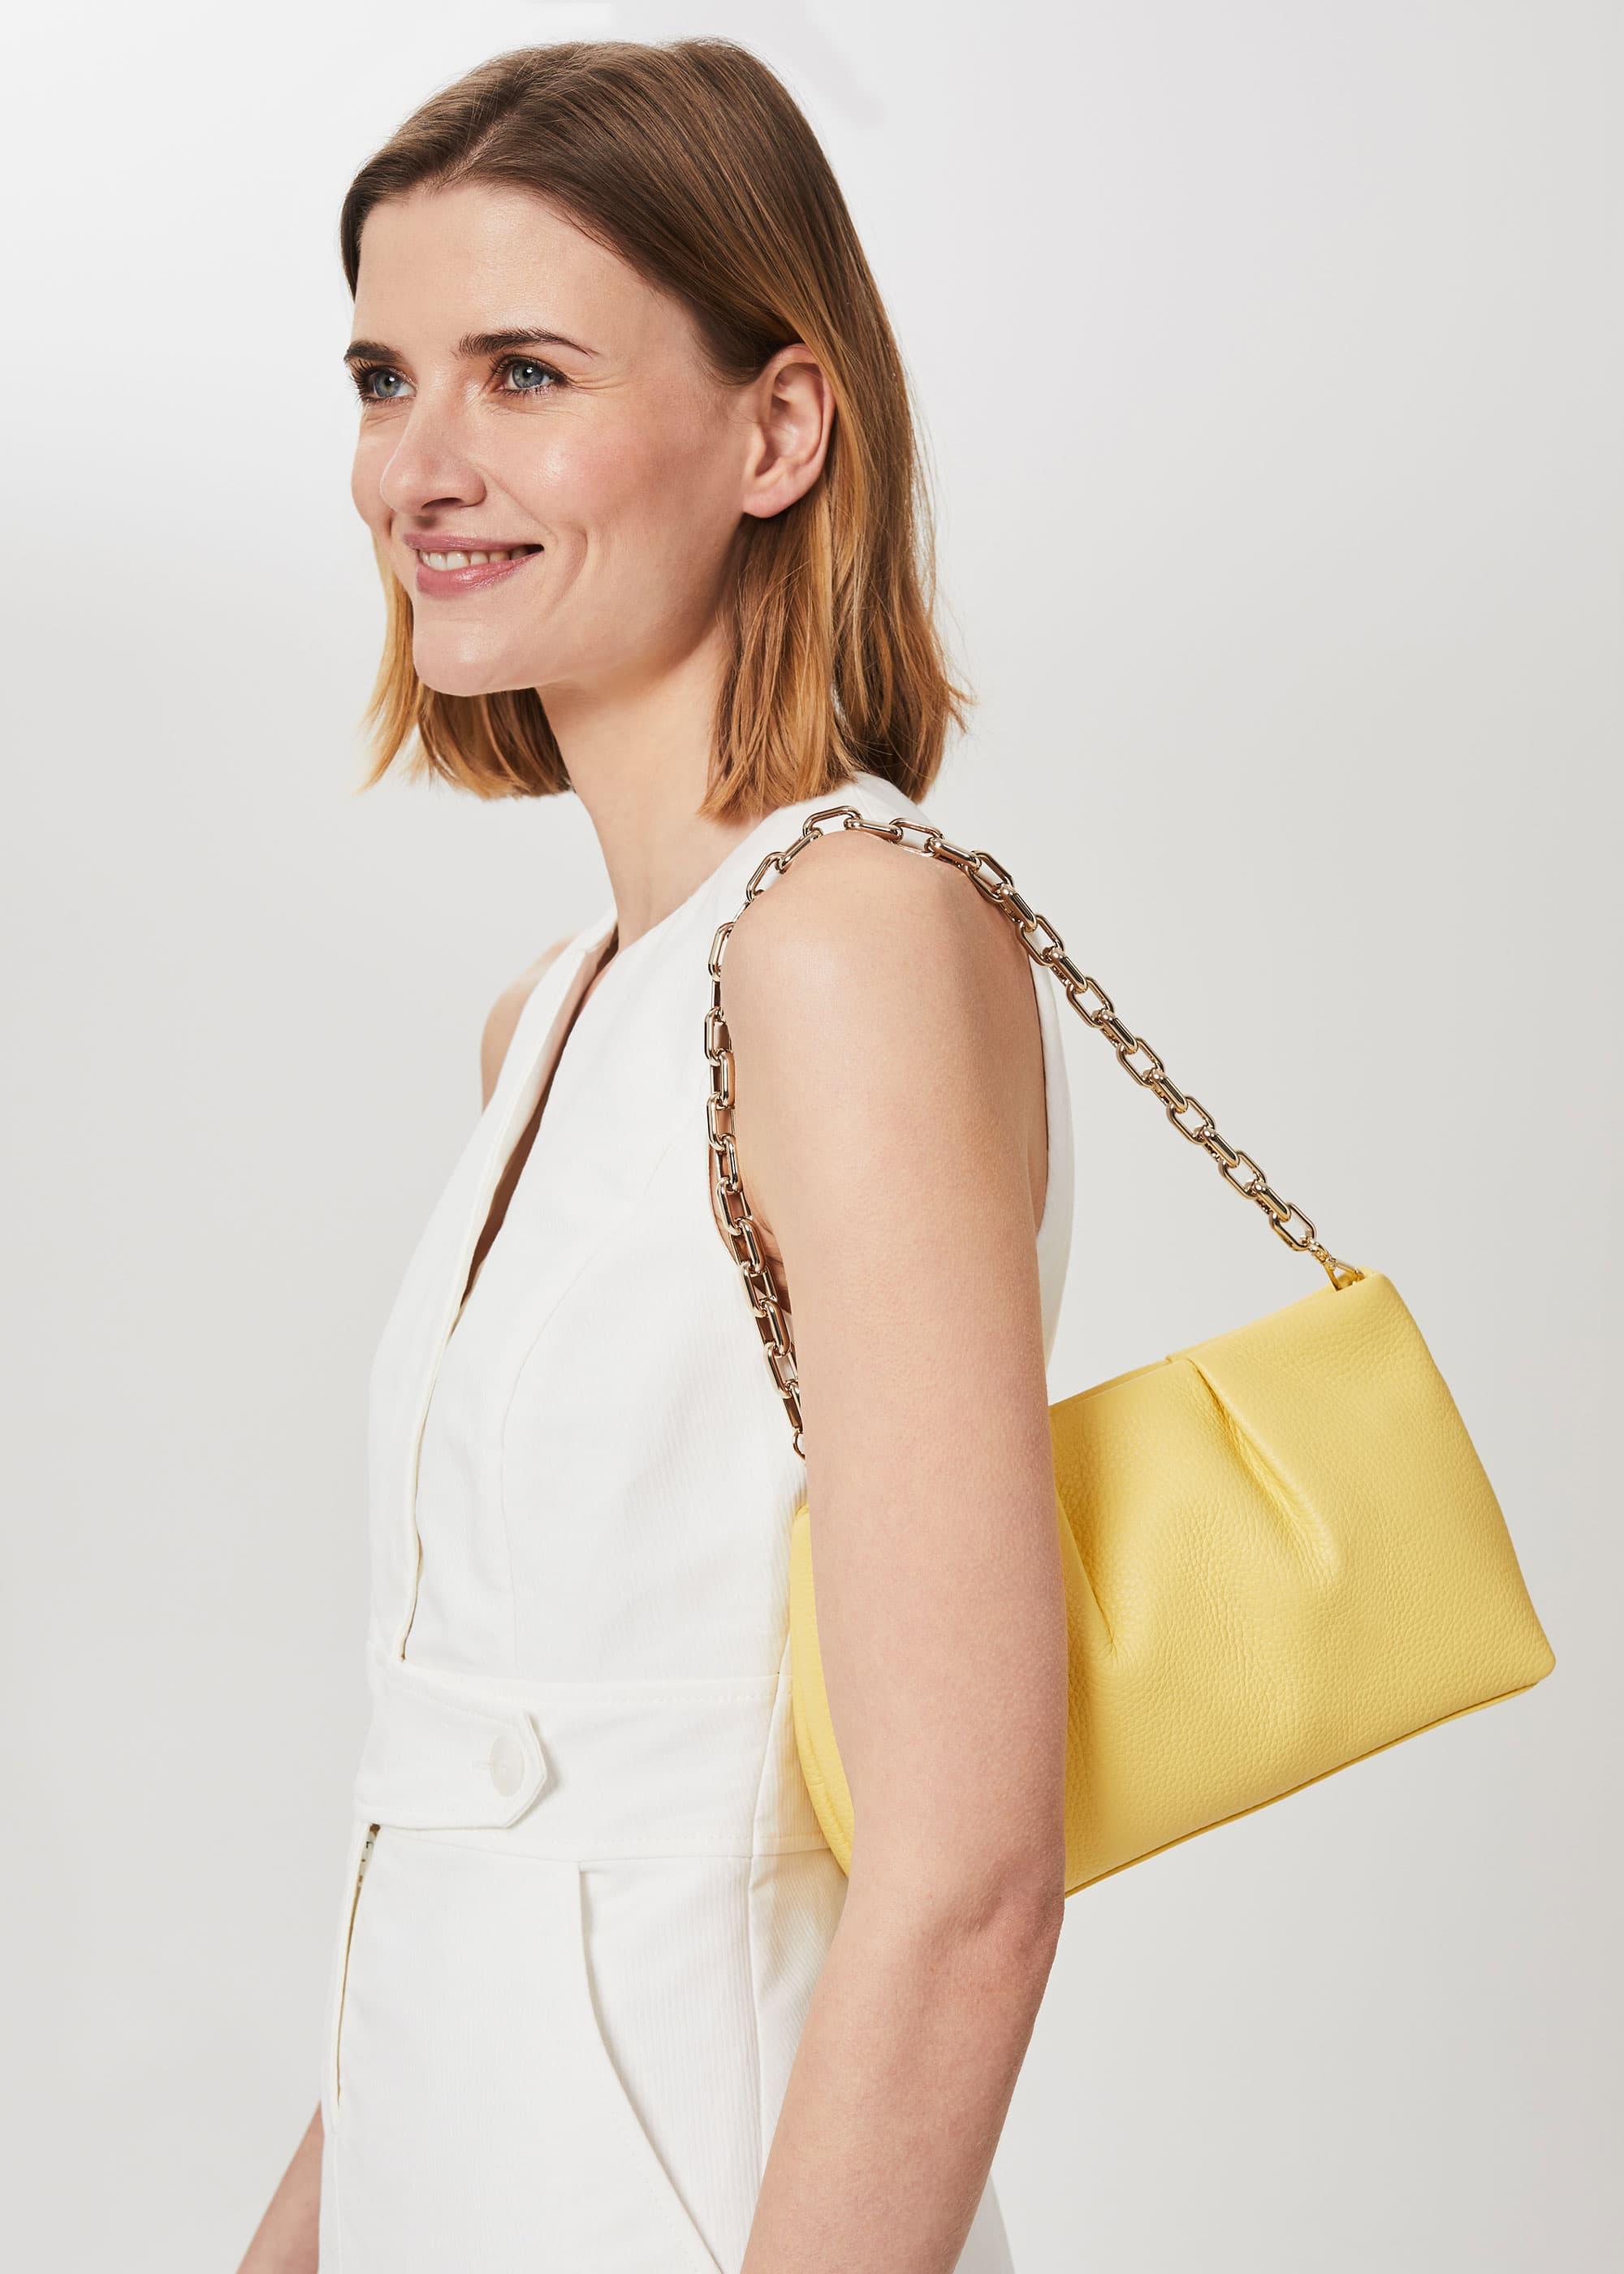 Hobbs Women Clifton Leather Clutch Bag